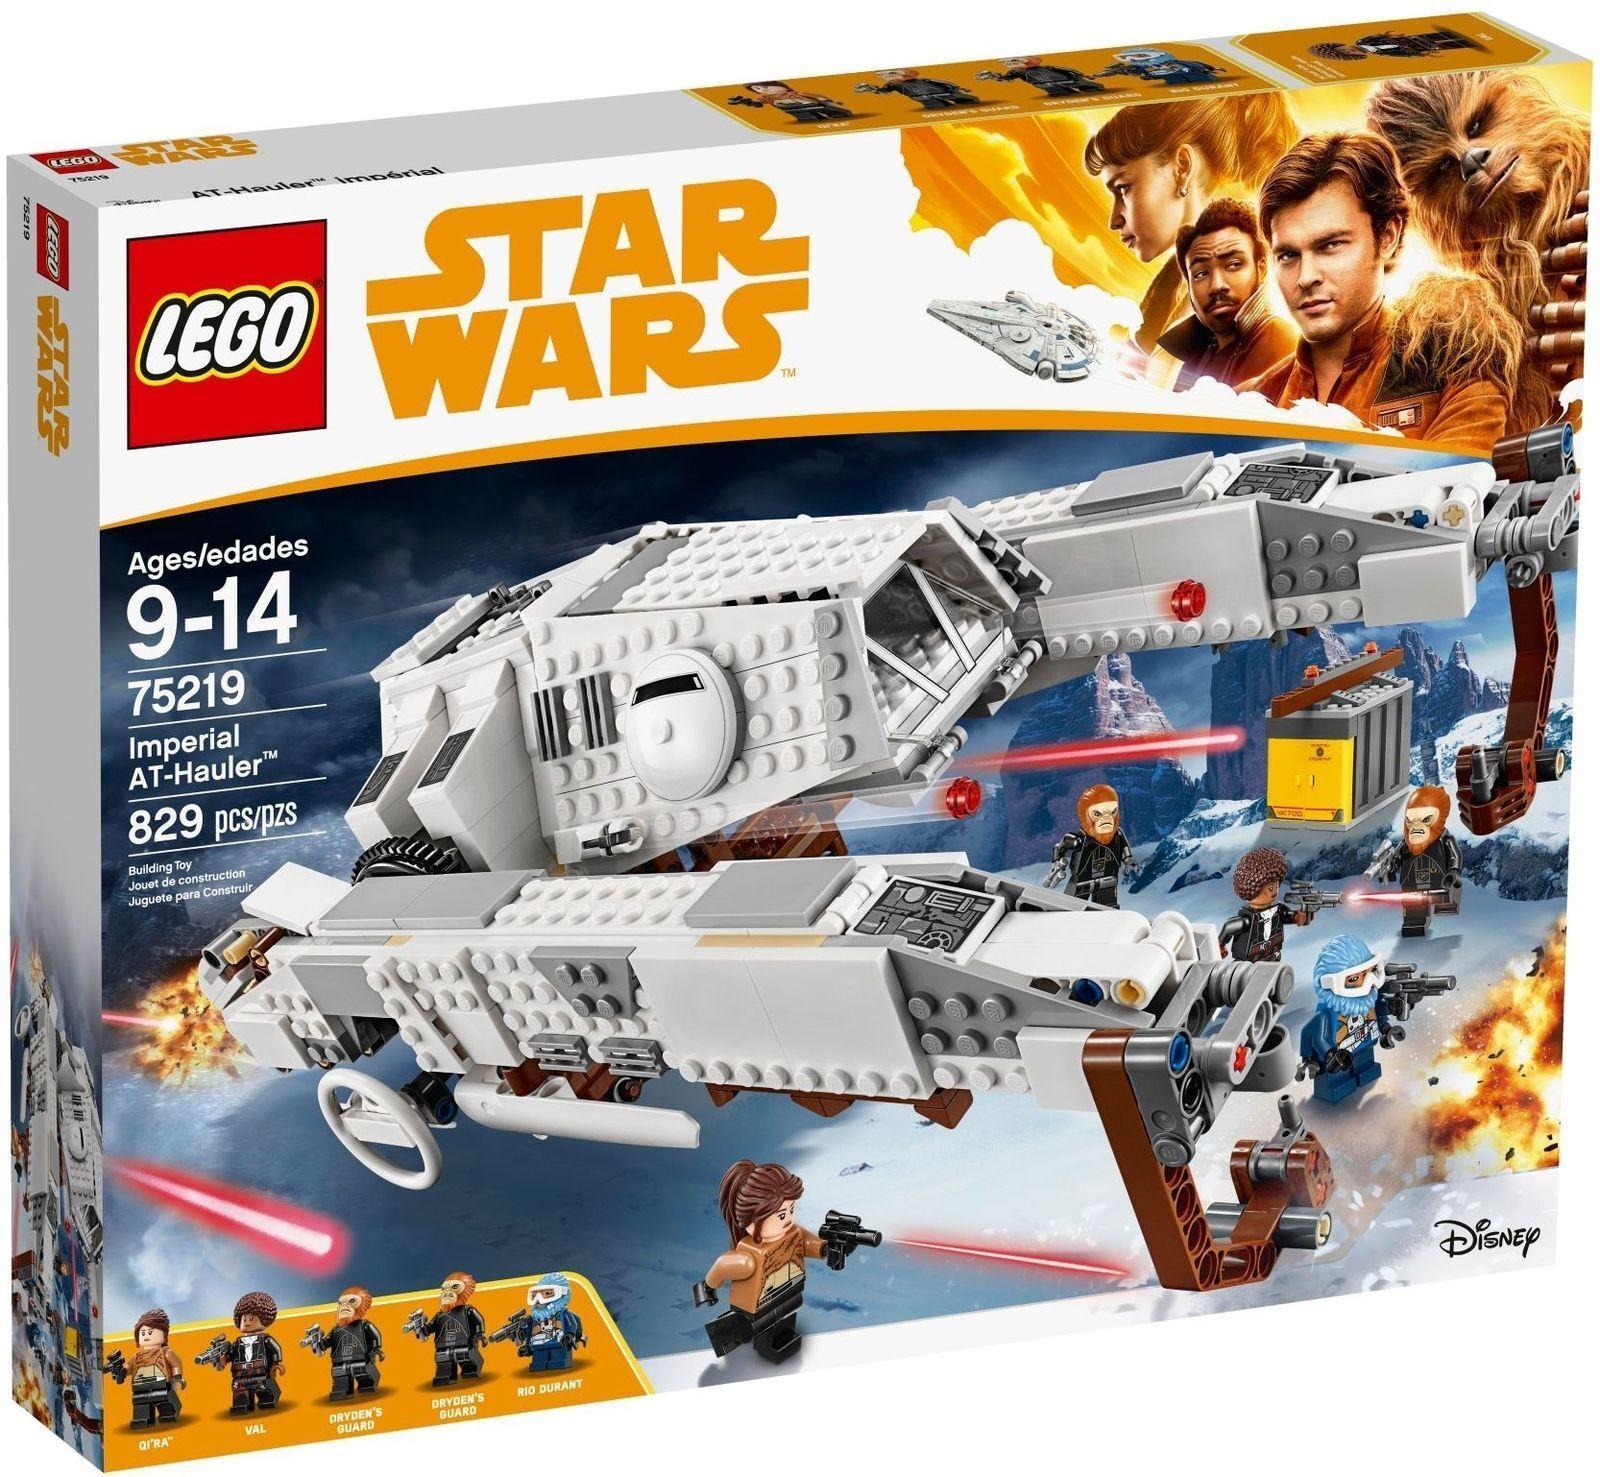 LEGO estrella guerras  75219 IMPERIAL AT-HAULER   NUOVO  benvenuto a comprare